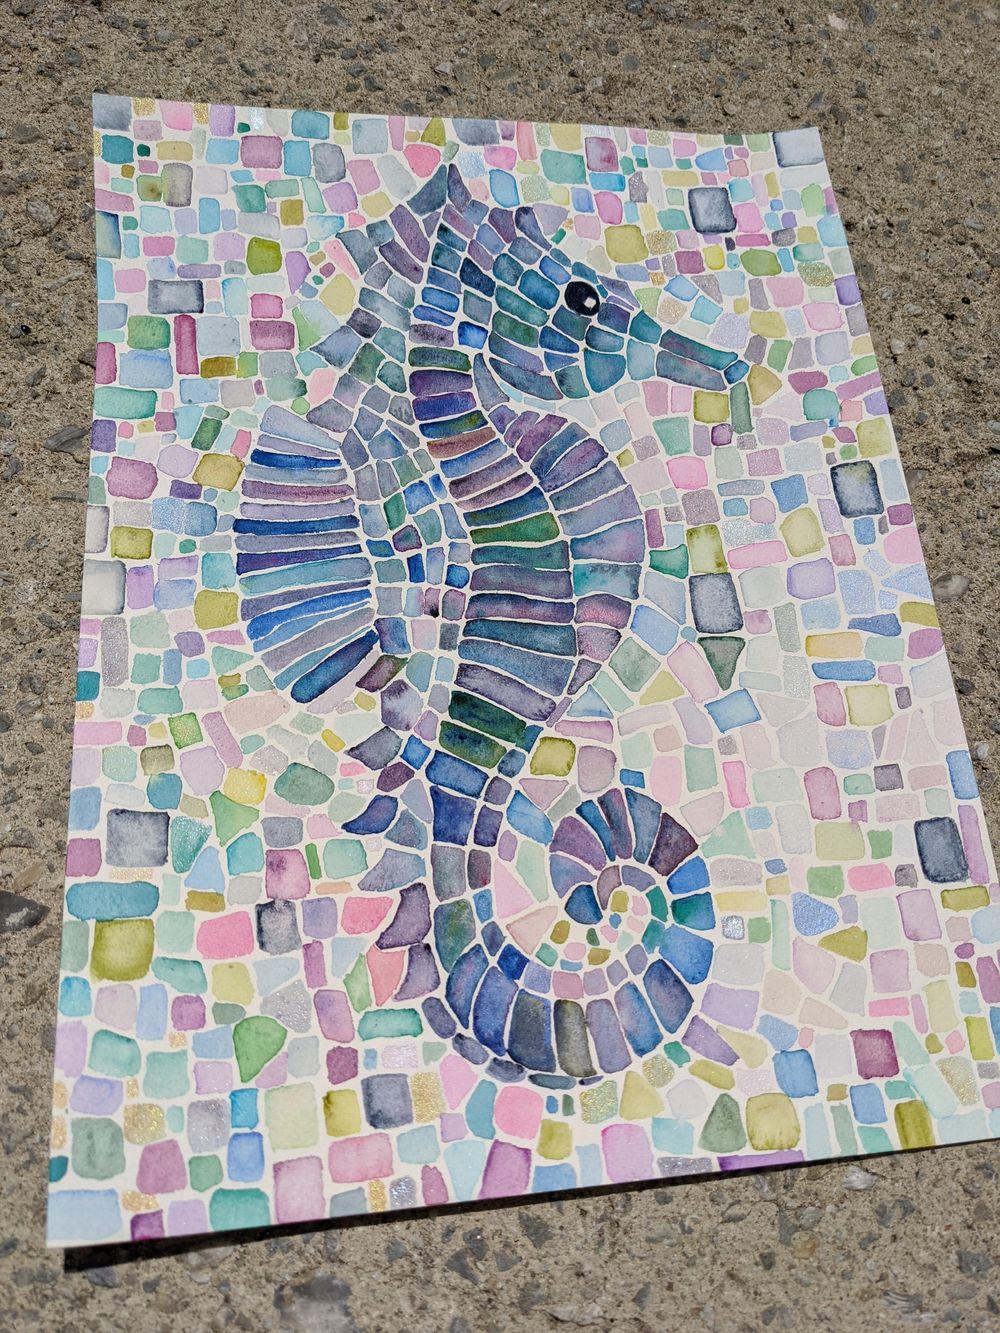 Mosaics -- Many Ways -- Seahorse, Sunset, Stained Glass Window, Yin Yang, Mermai - image 5 - student project